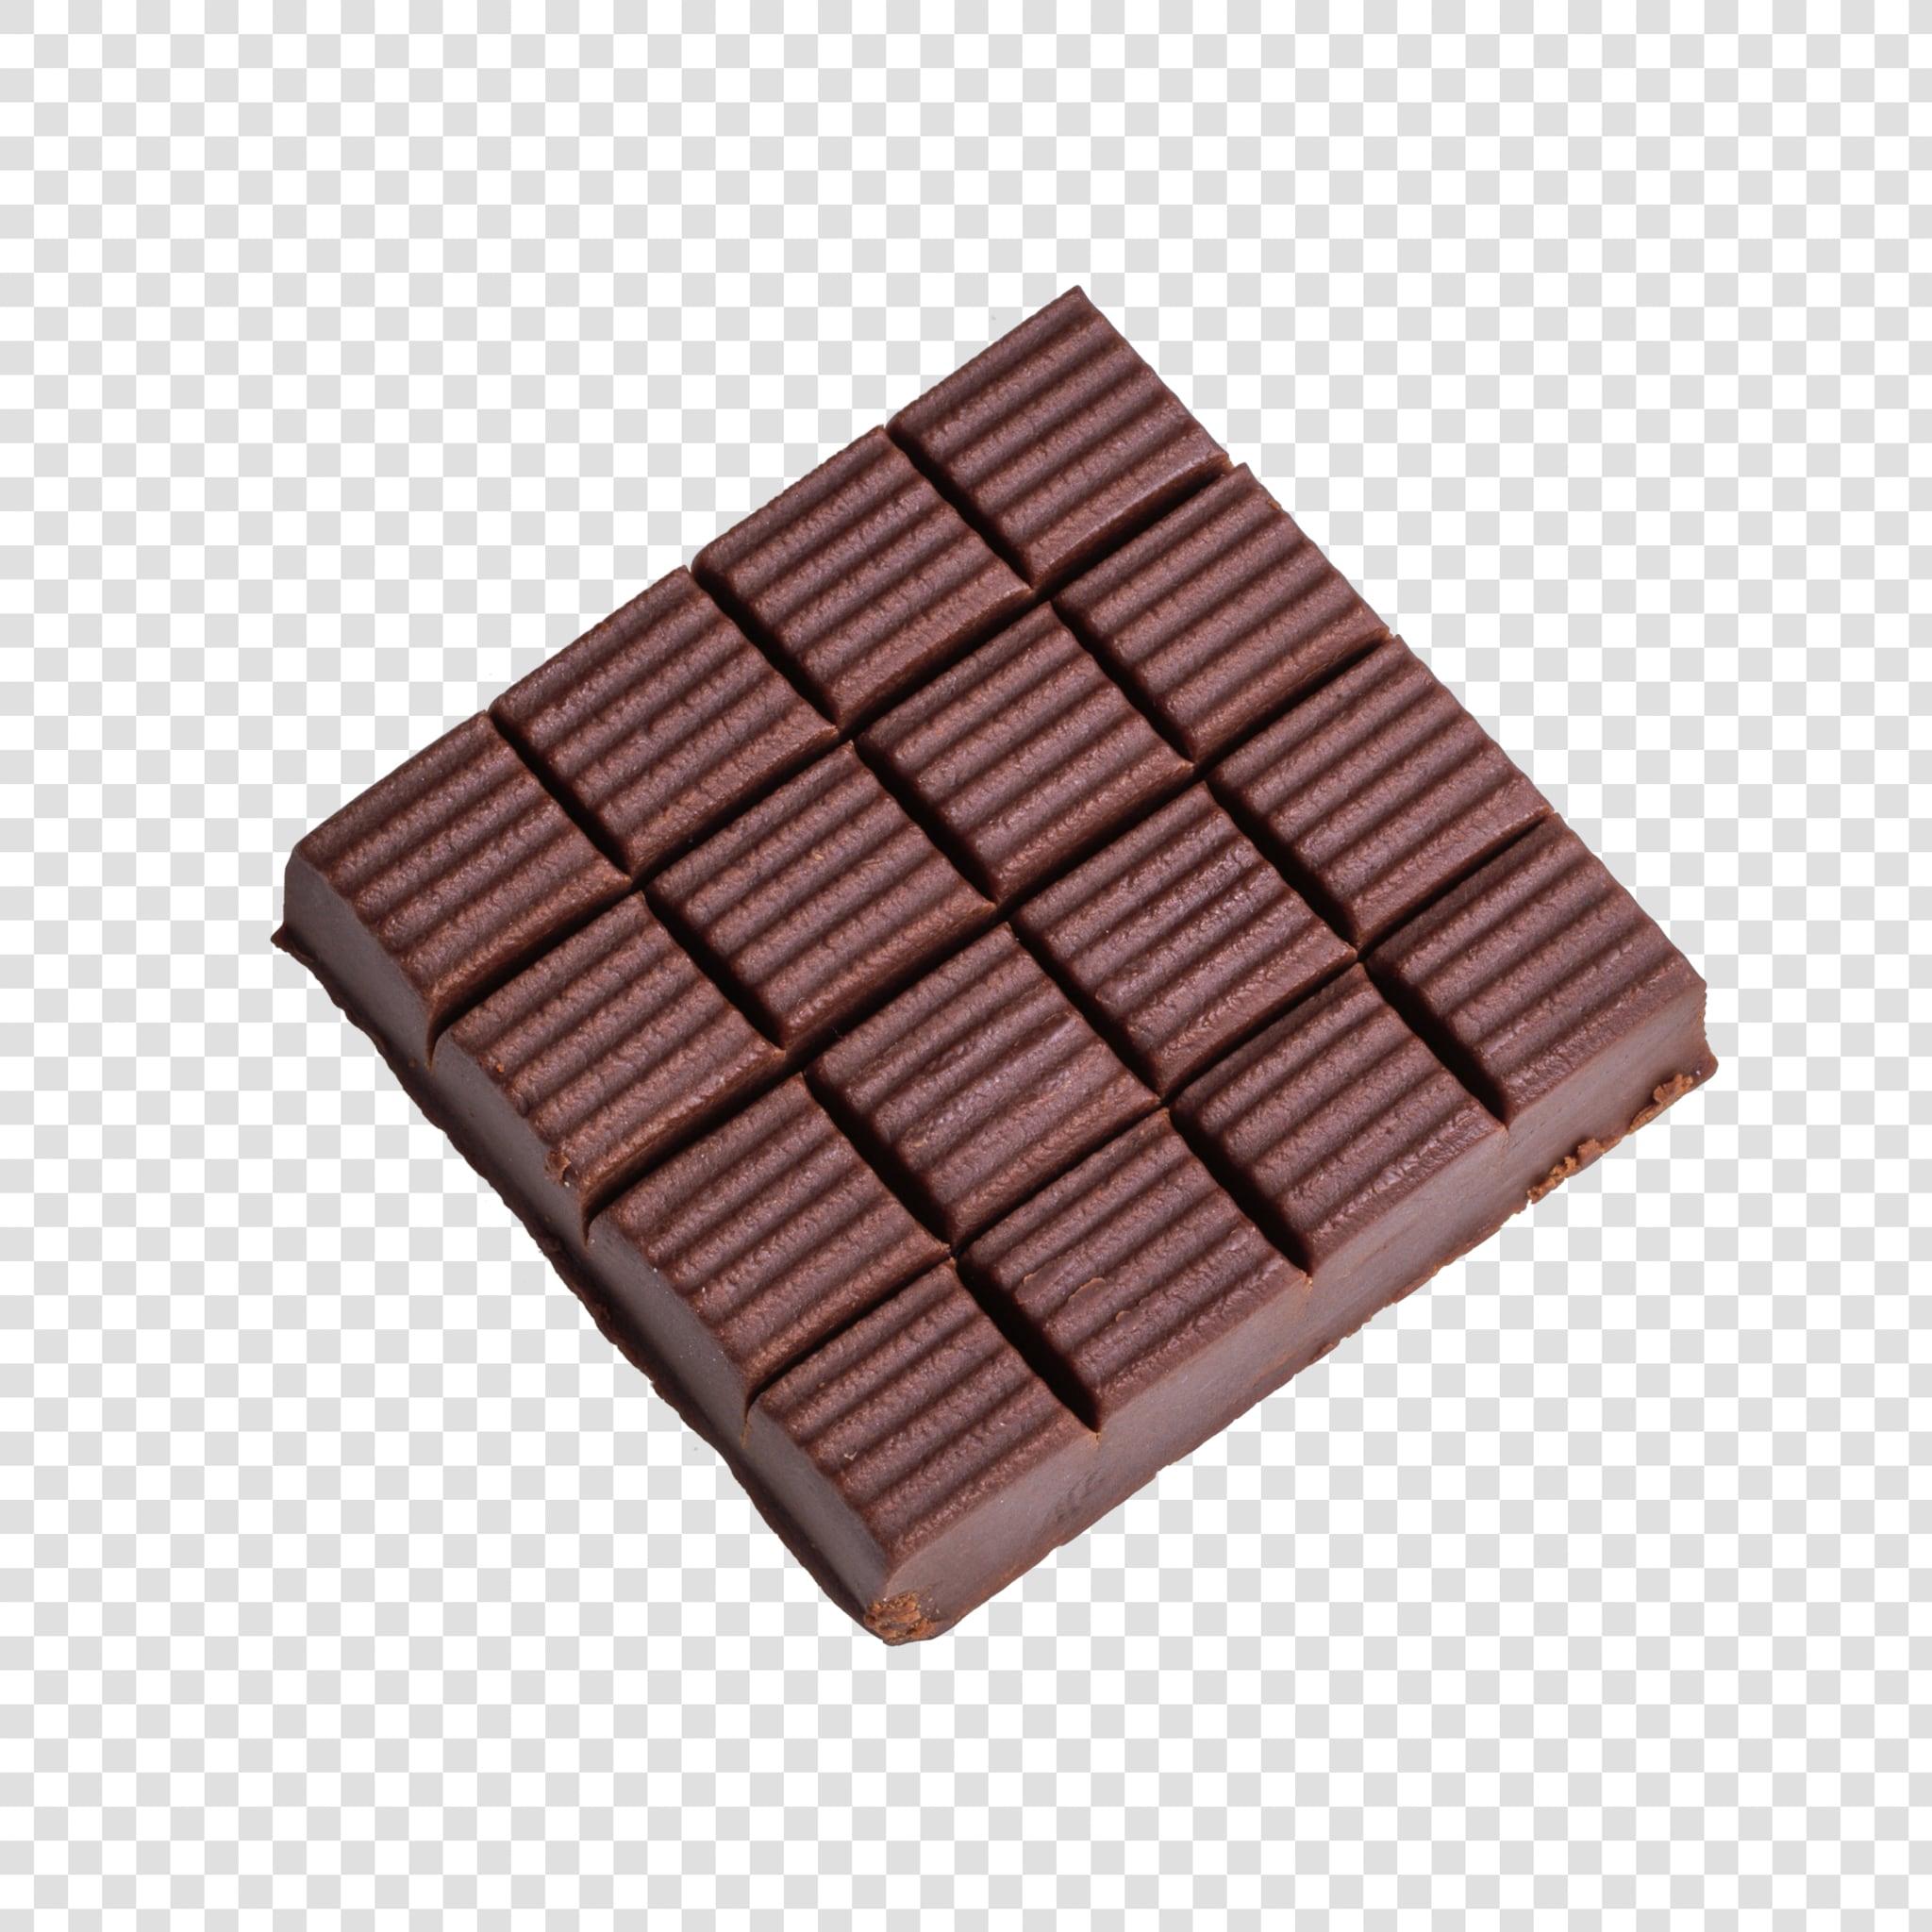 Chocolate PSD layered image